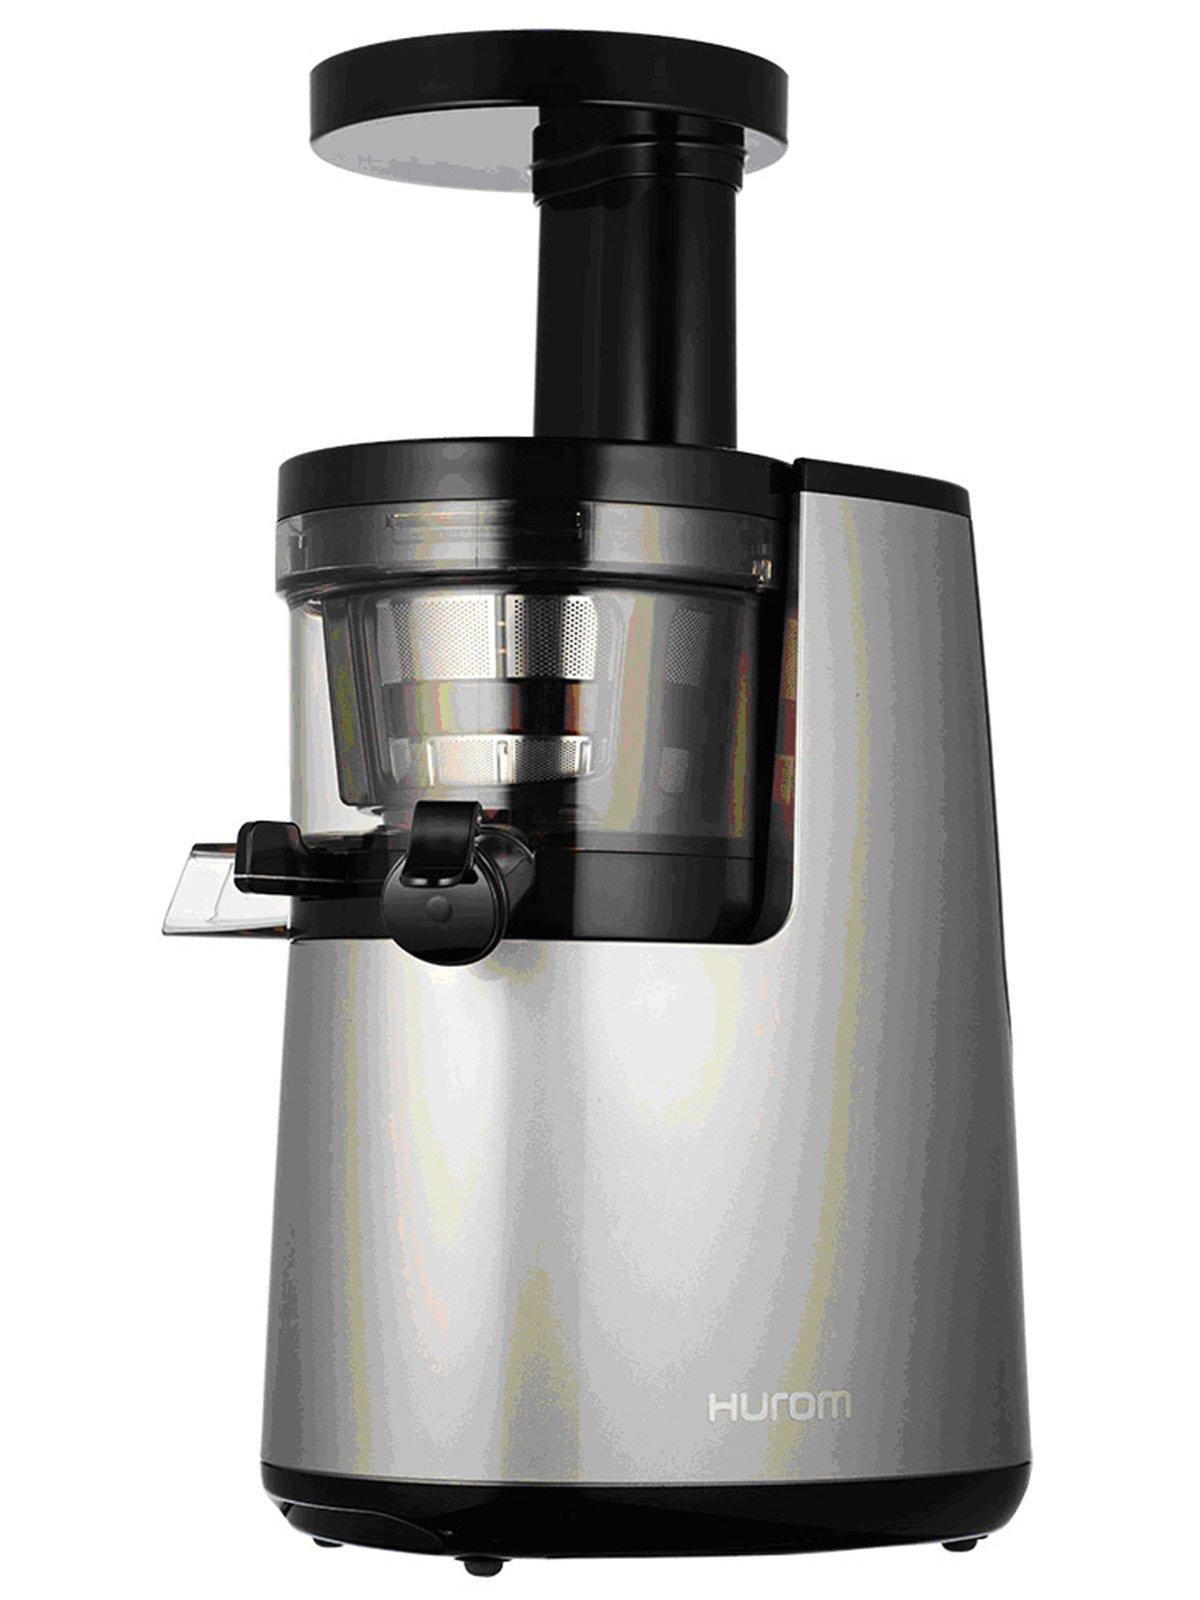 Slow Juicer Hd Line Di Hotpoint Ariston : Estrattori di succo di frutta e verdure - Cose di Casa